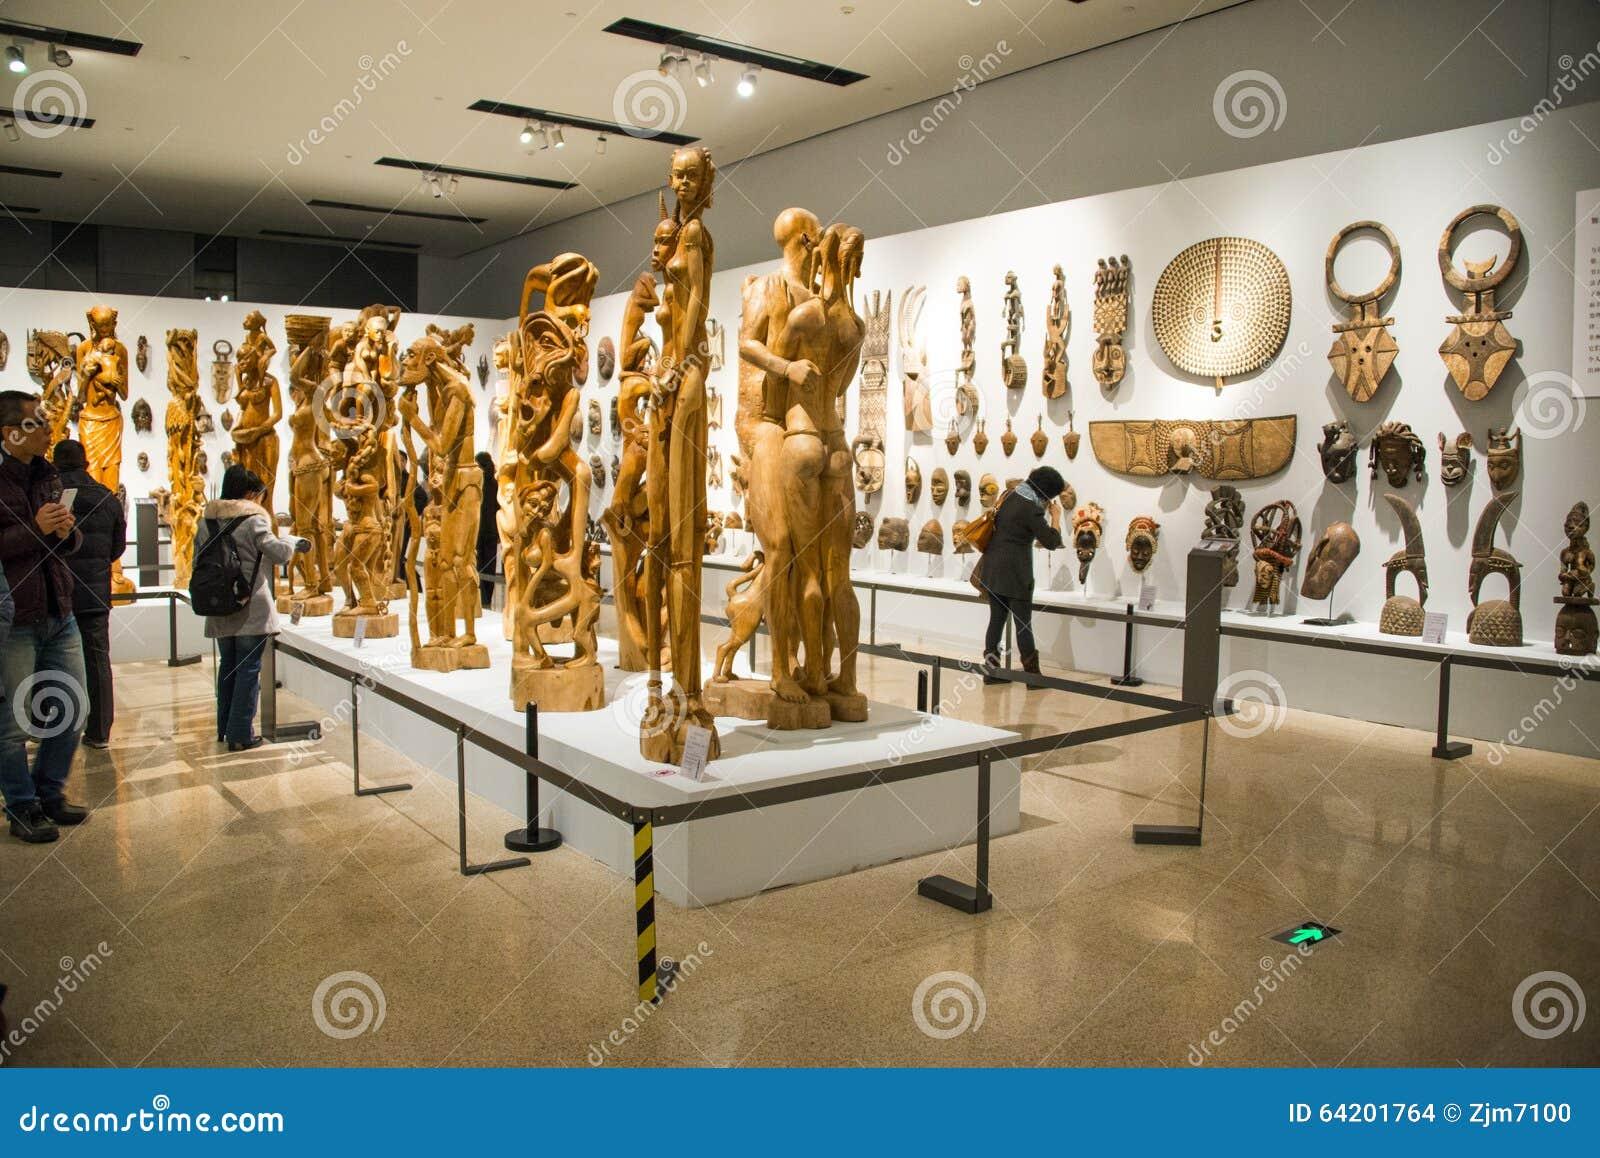 Asia China, Pekín, Museo Nacional, sala de exposiciones interior